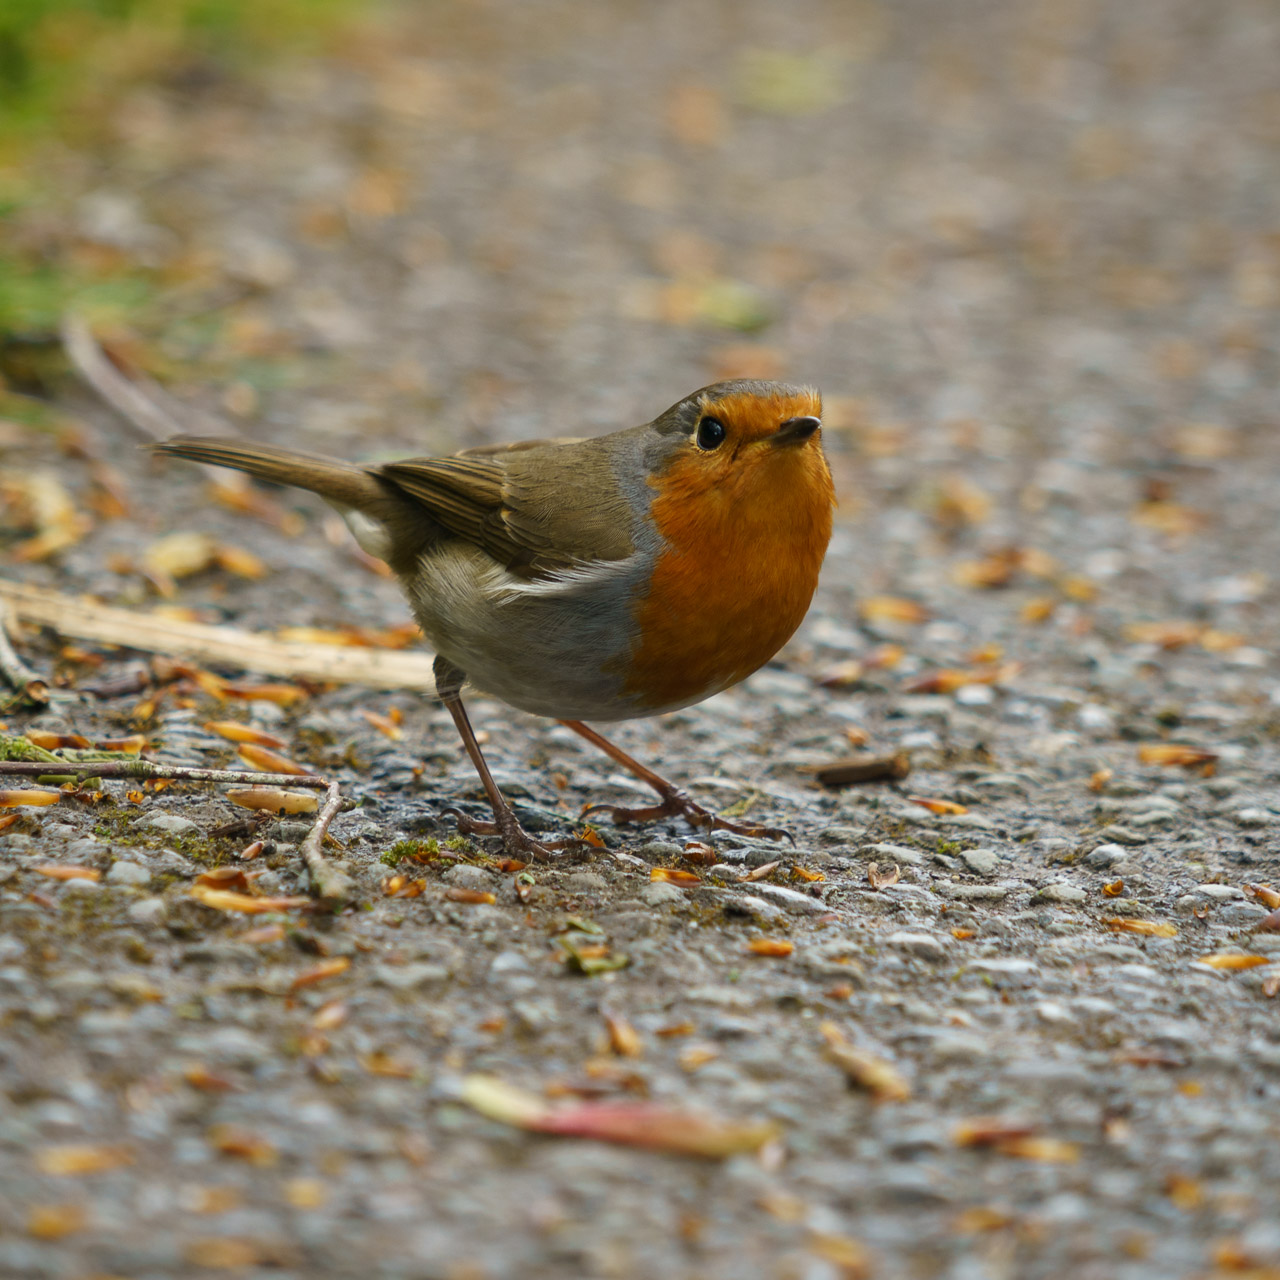 My Robin Friend